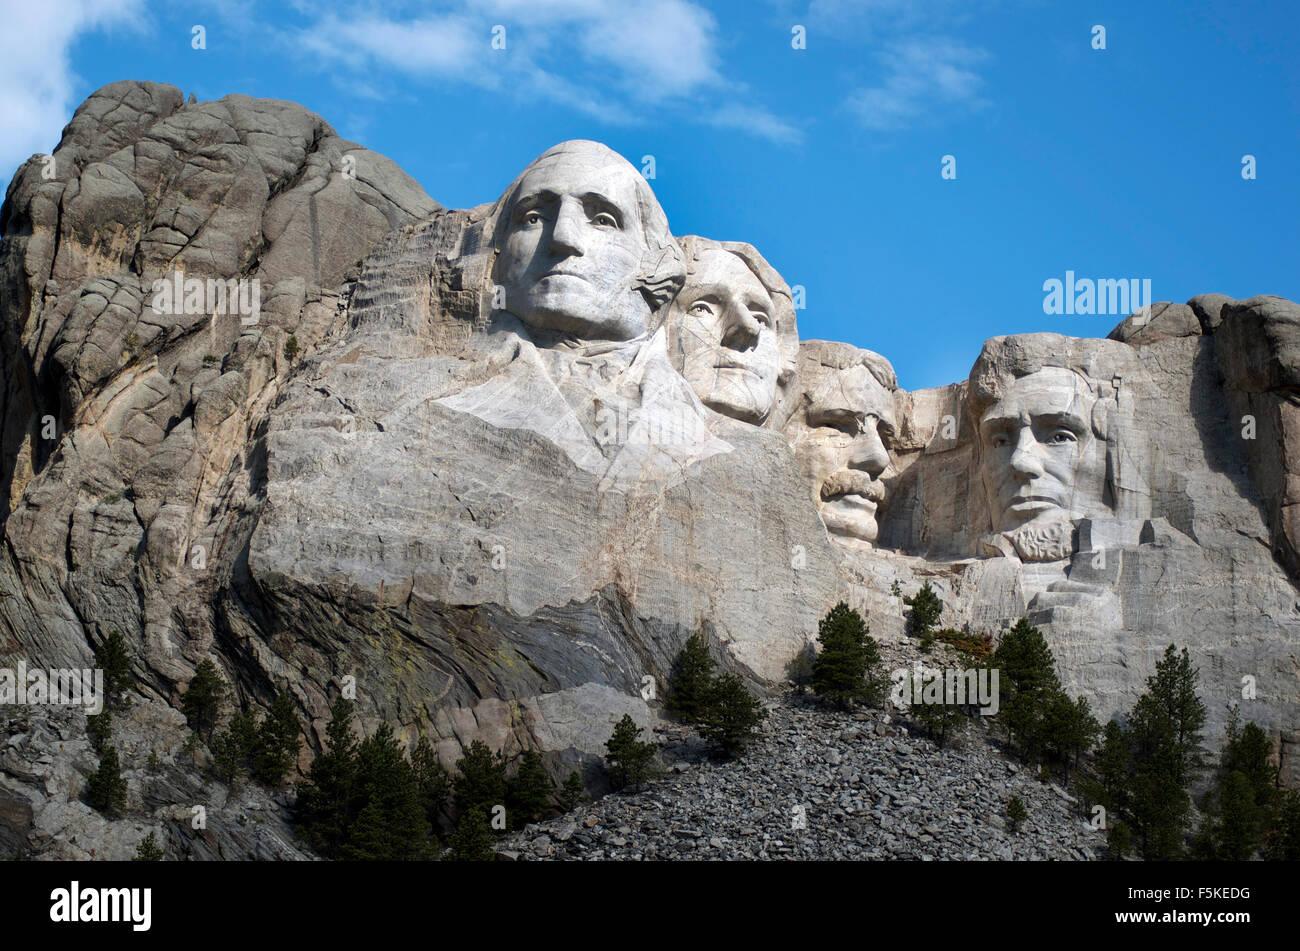 Mt Rushmore National Memorial, U.S. National Park Service Stock Photo